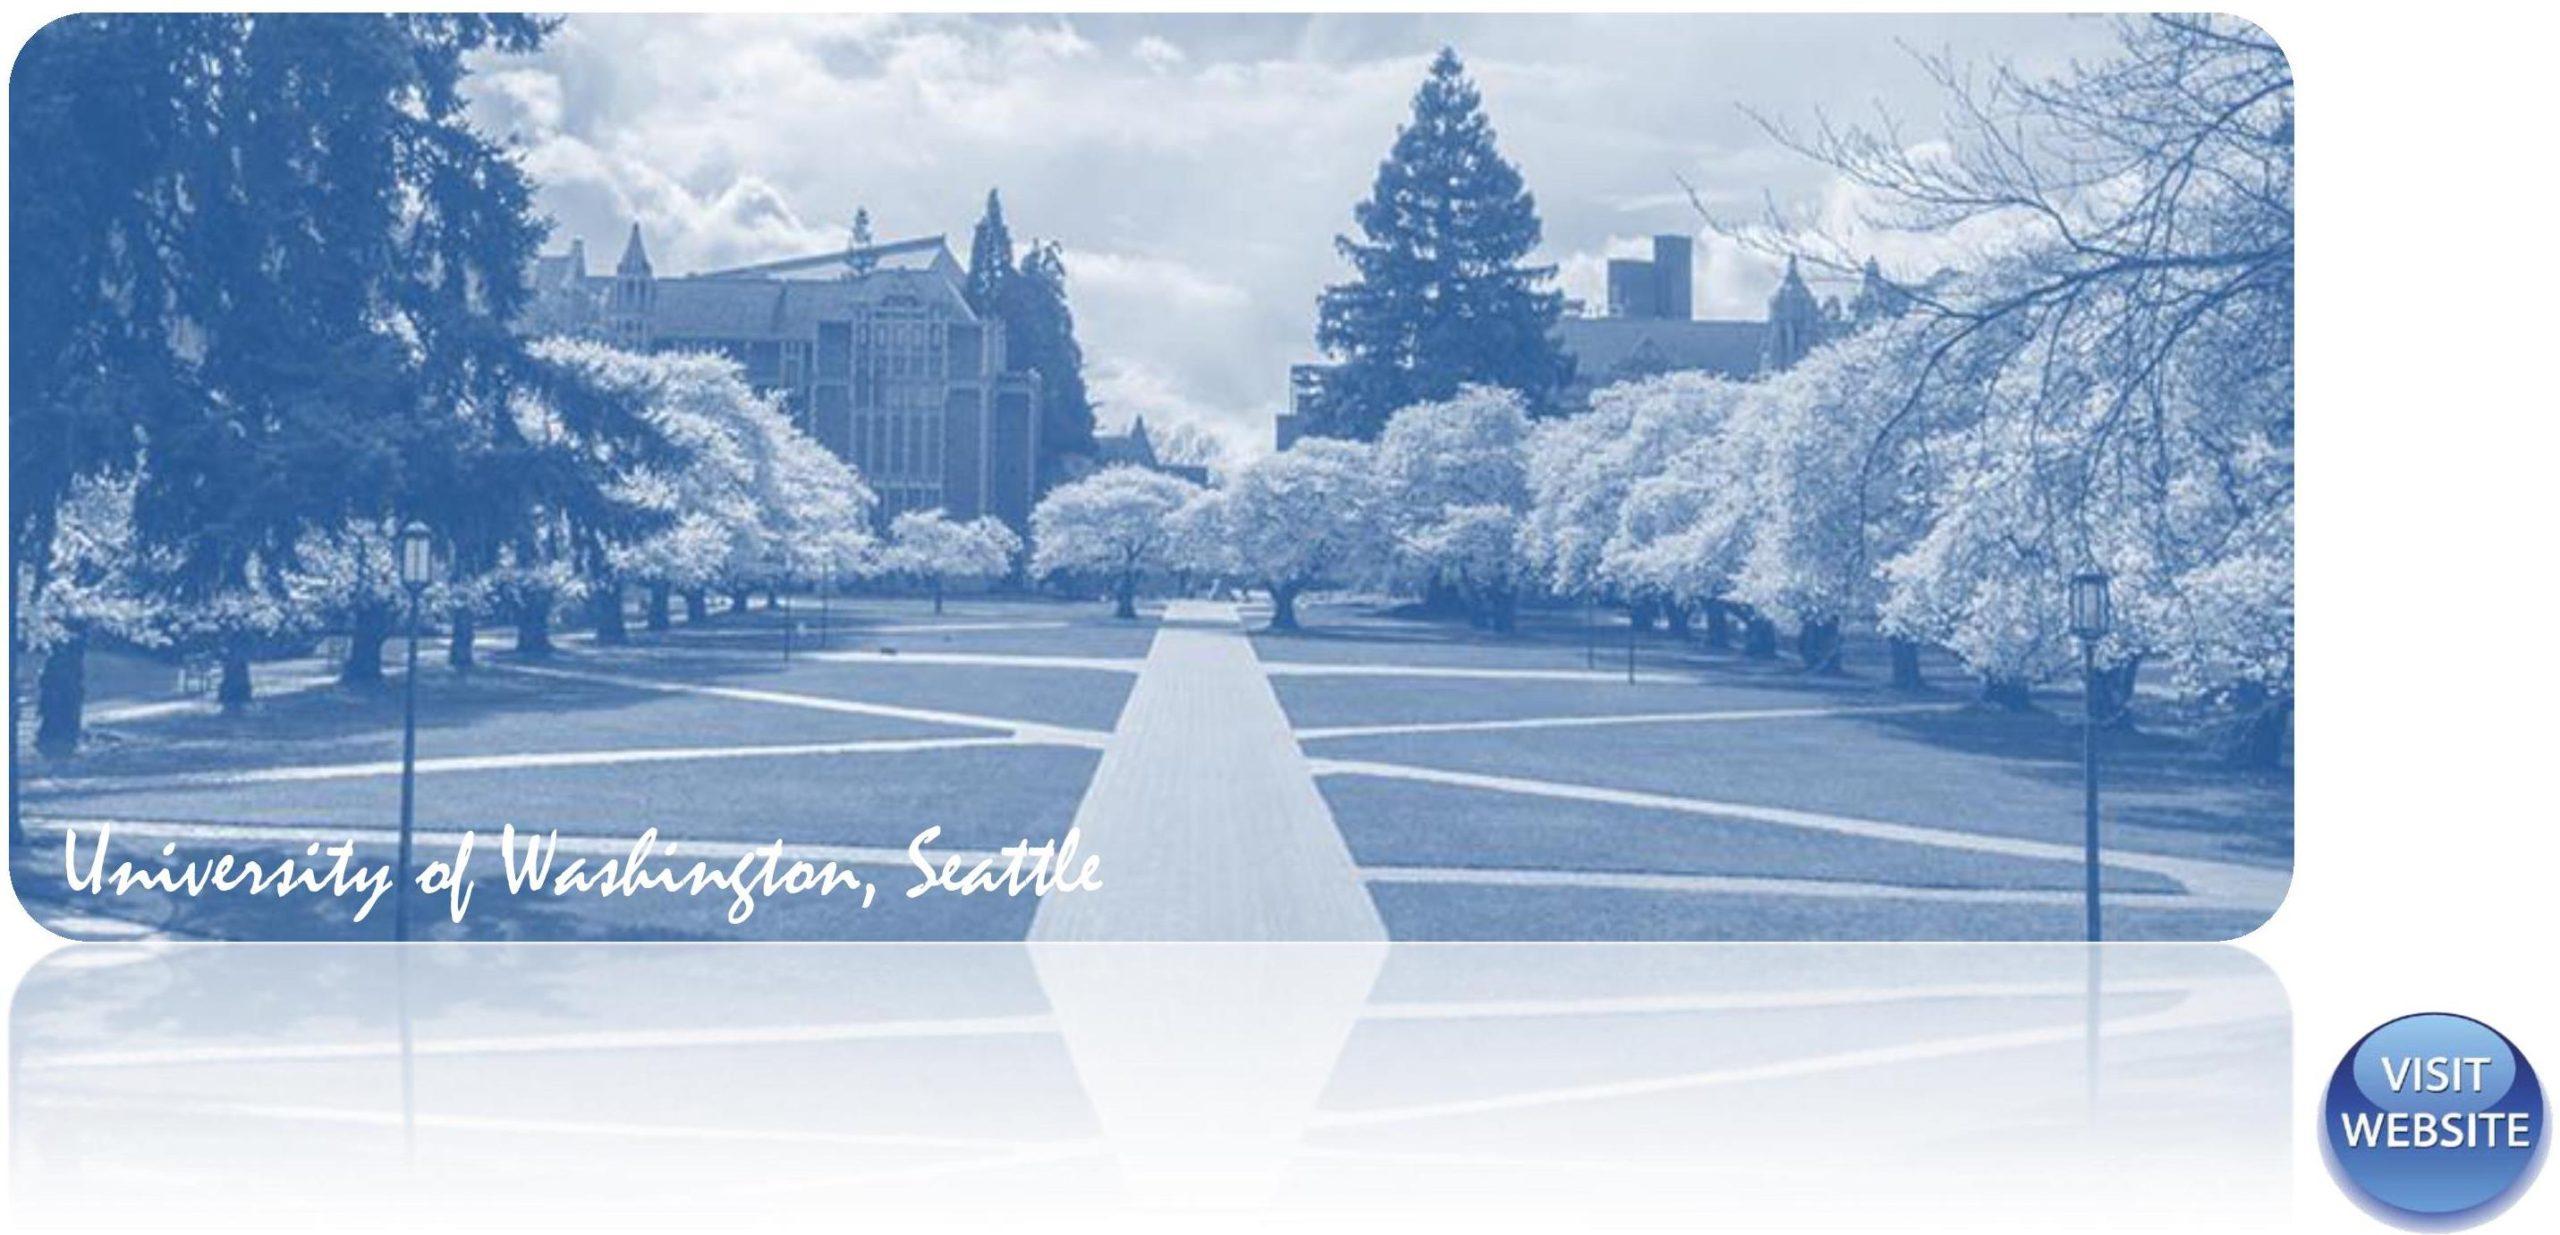 University of Washington, Seattle USA